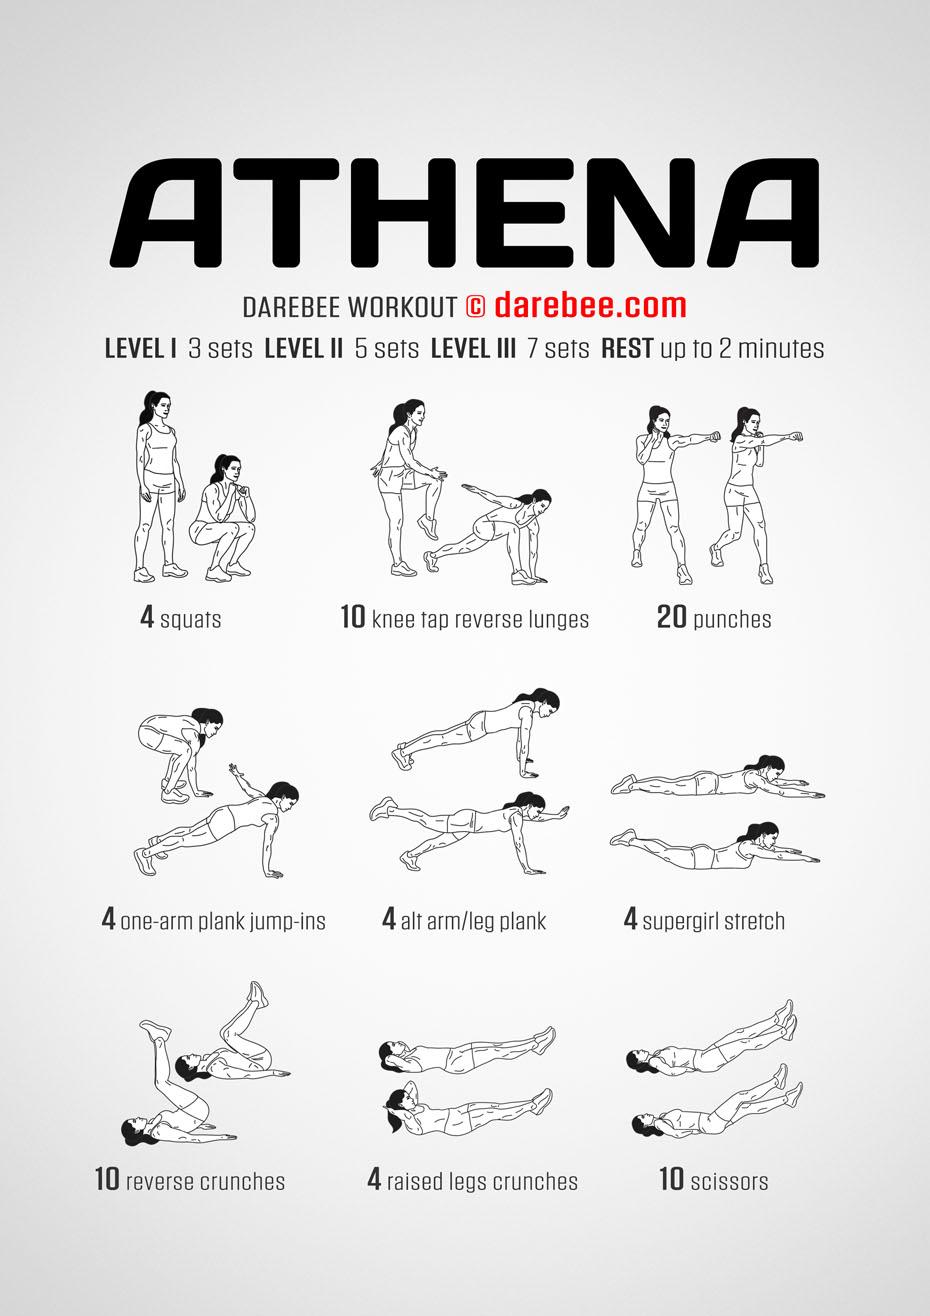 athena-workout.jpg